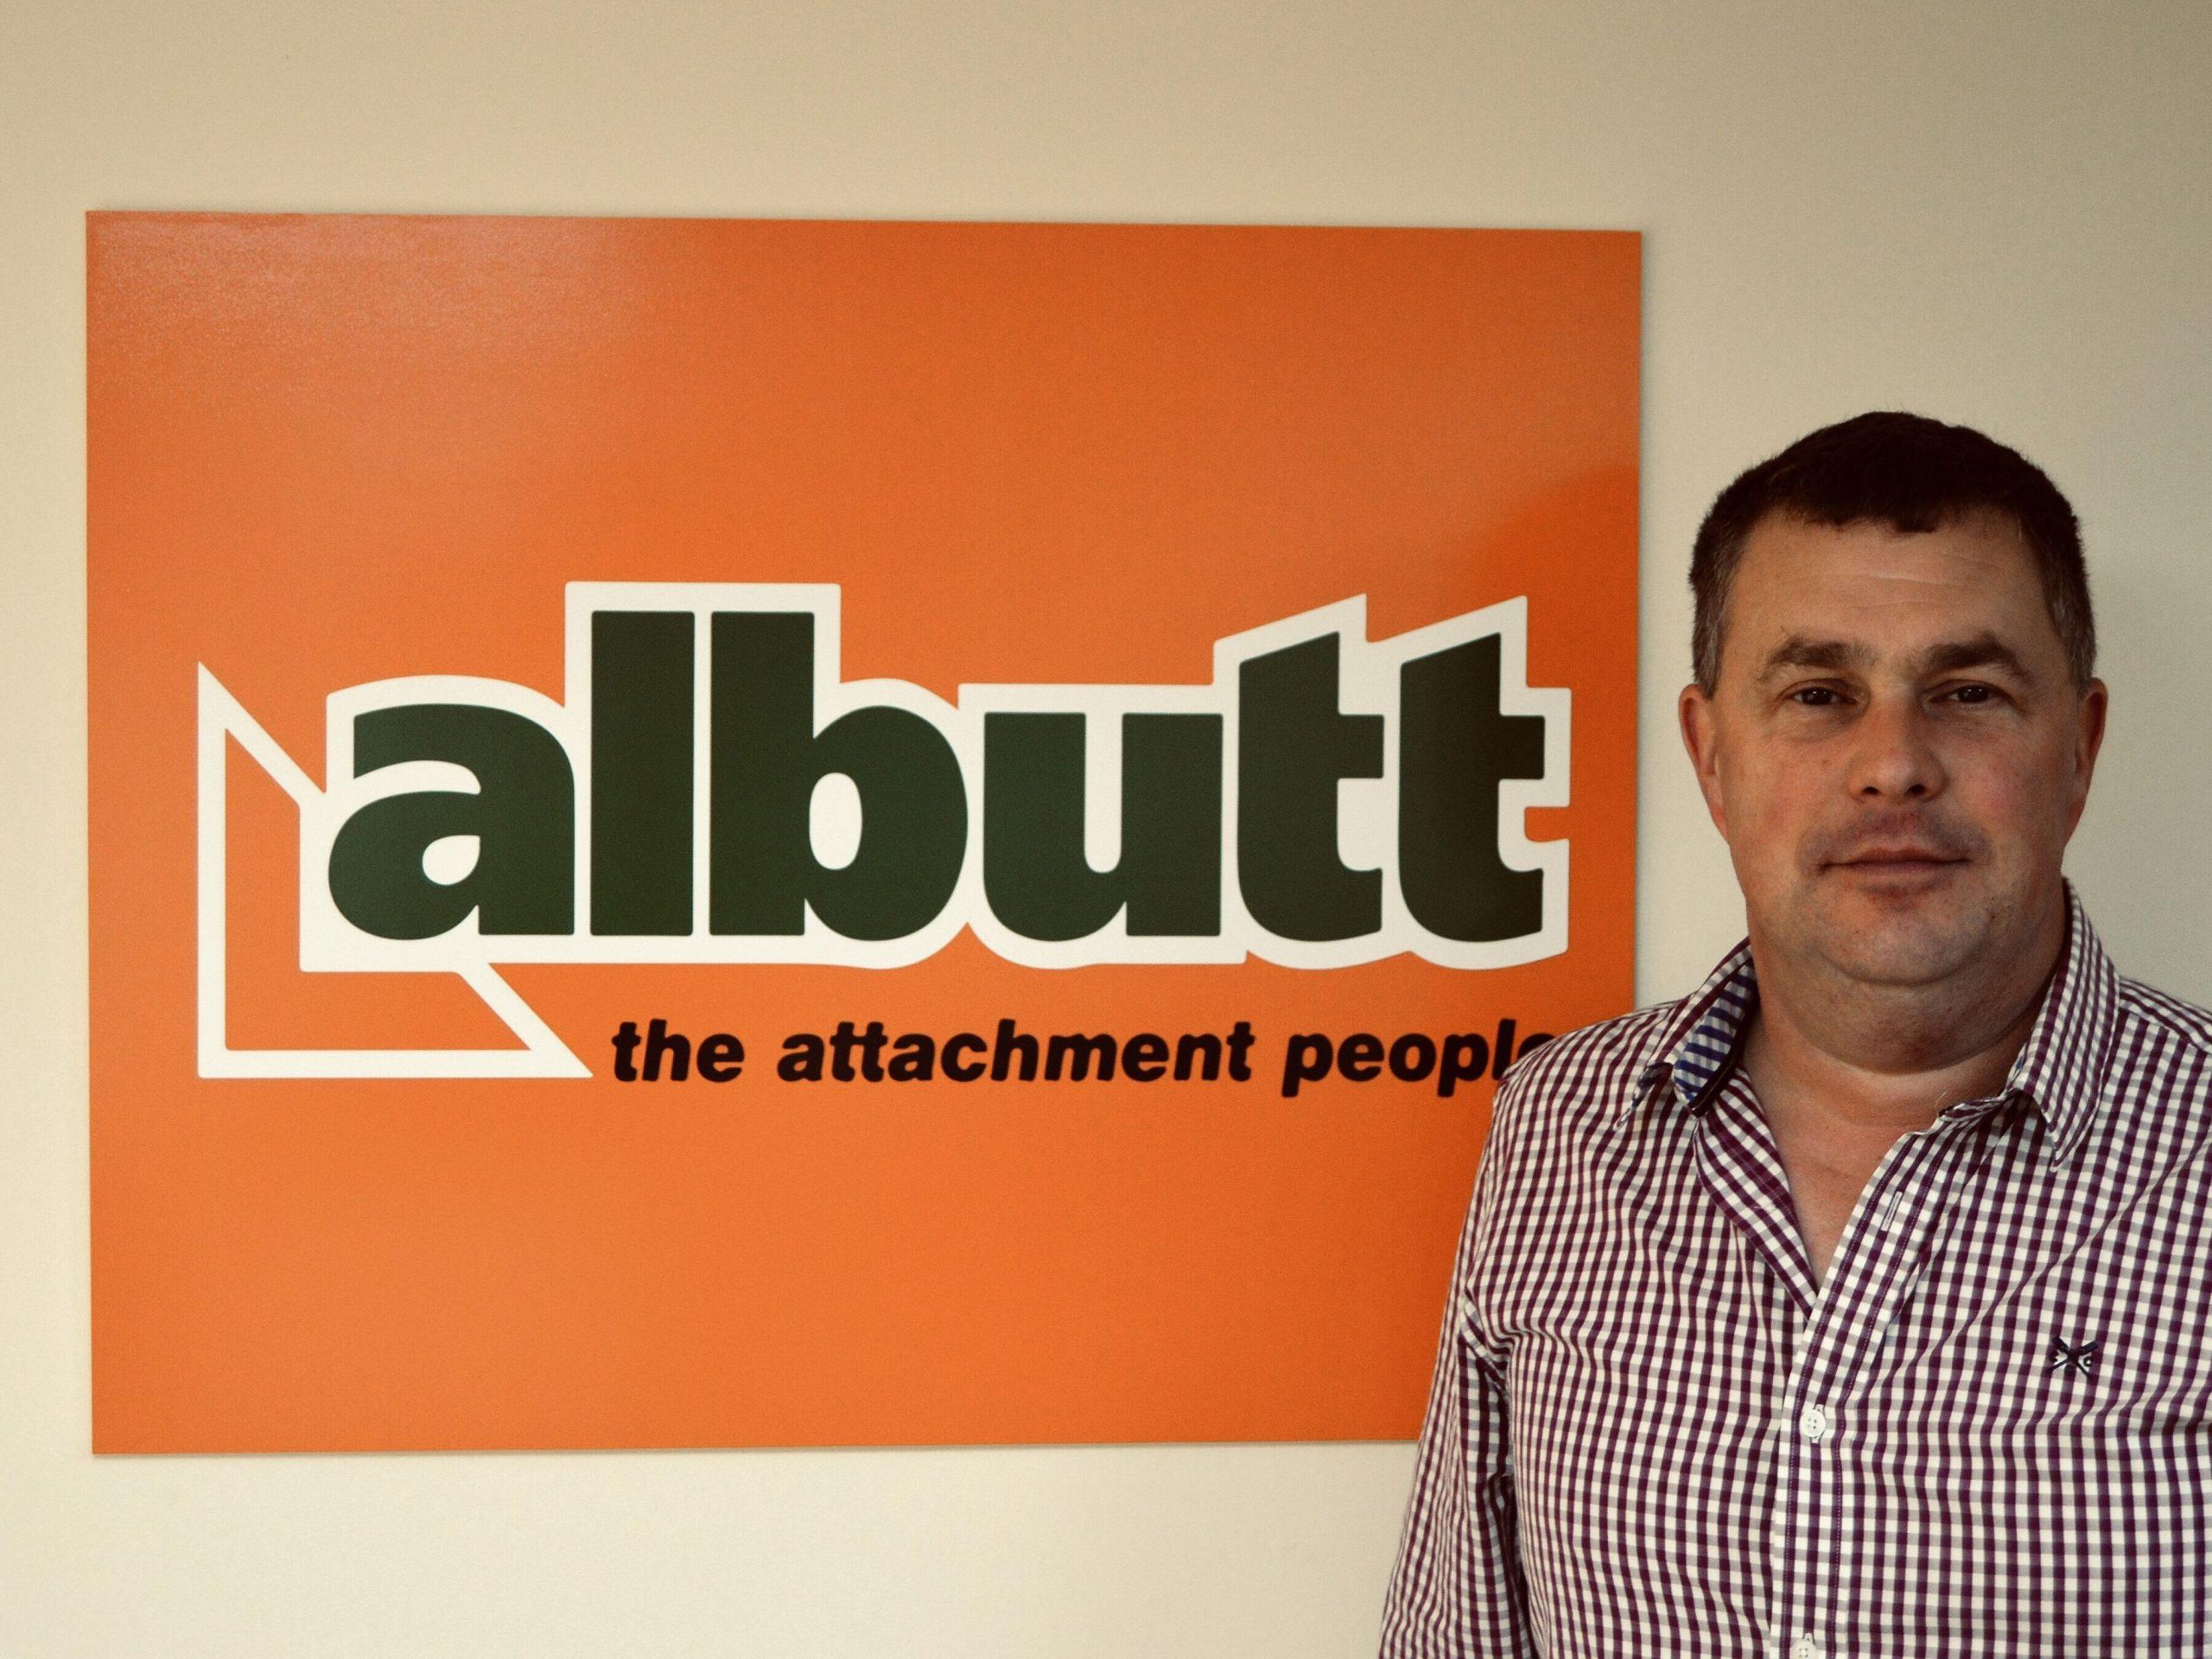 Alistair Albutt